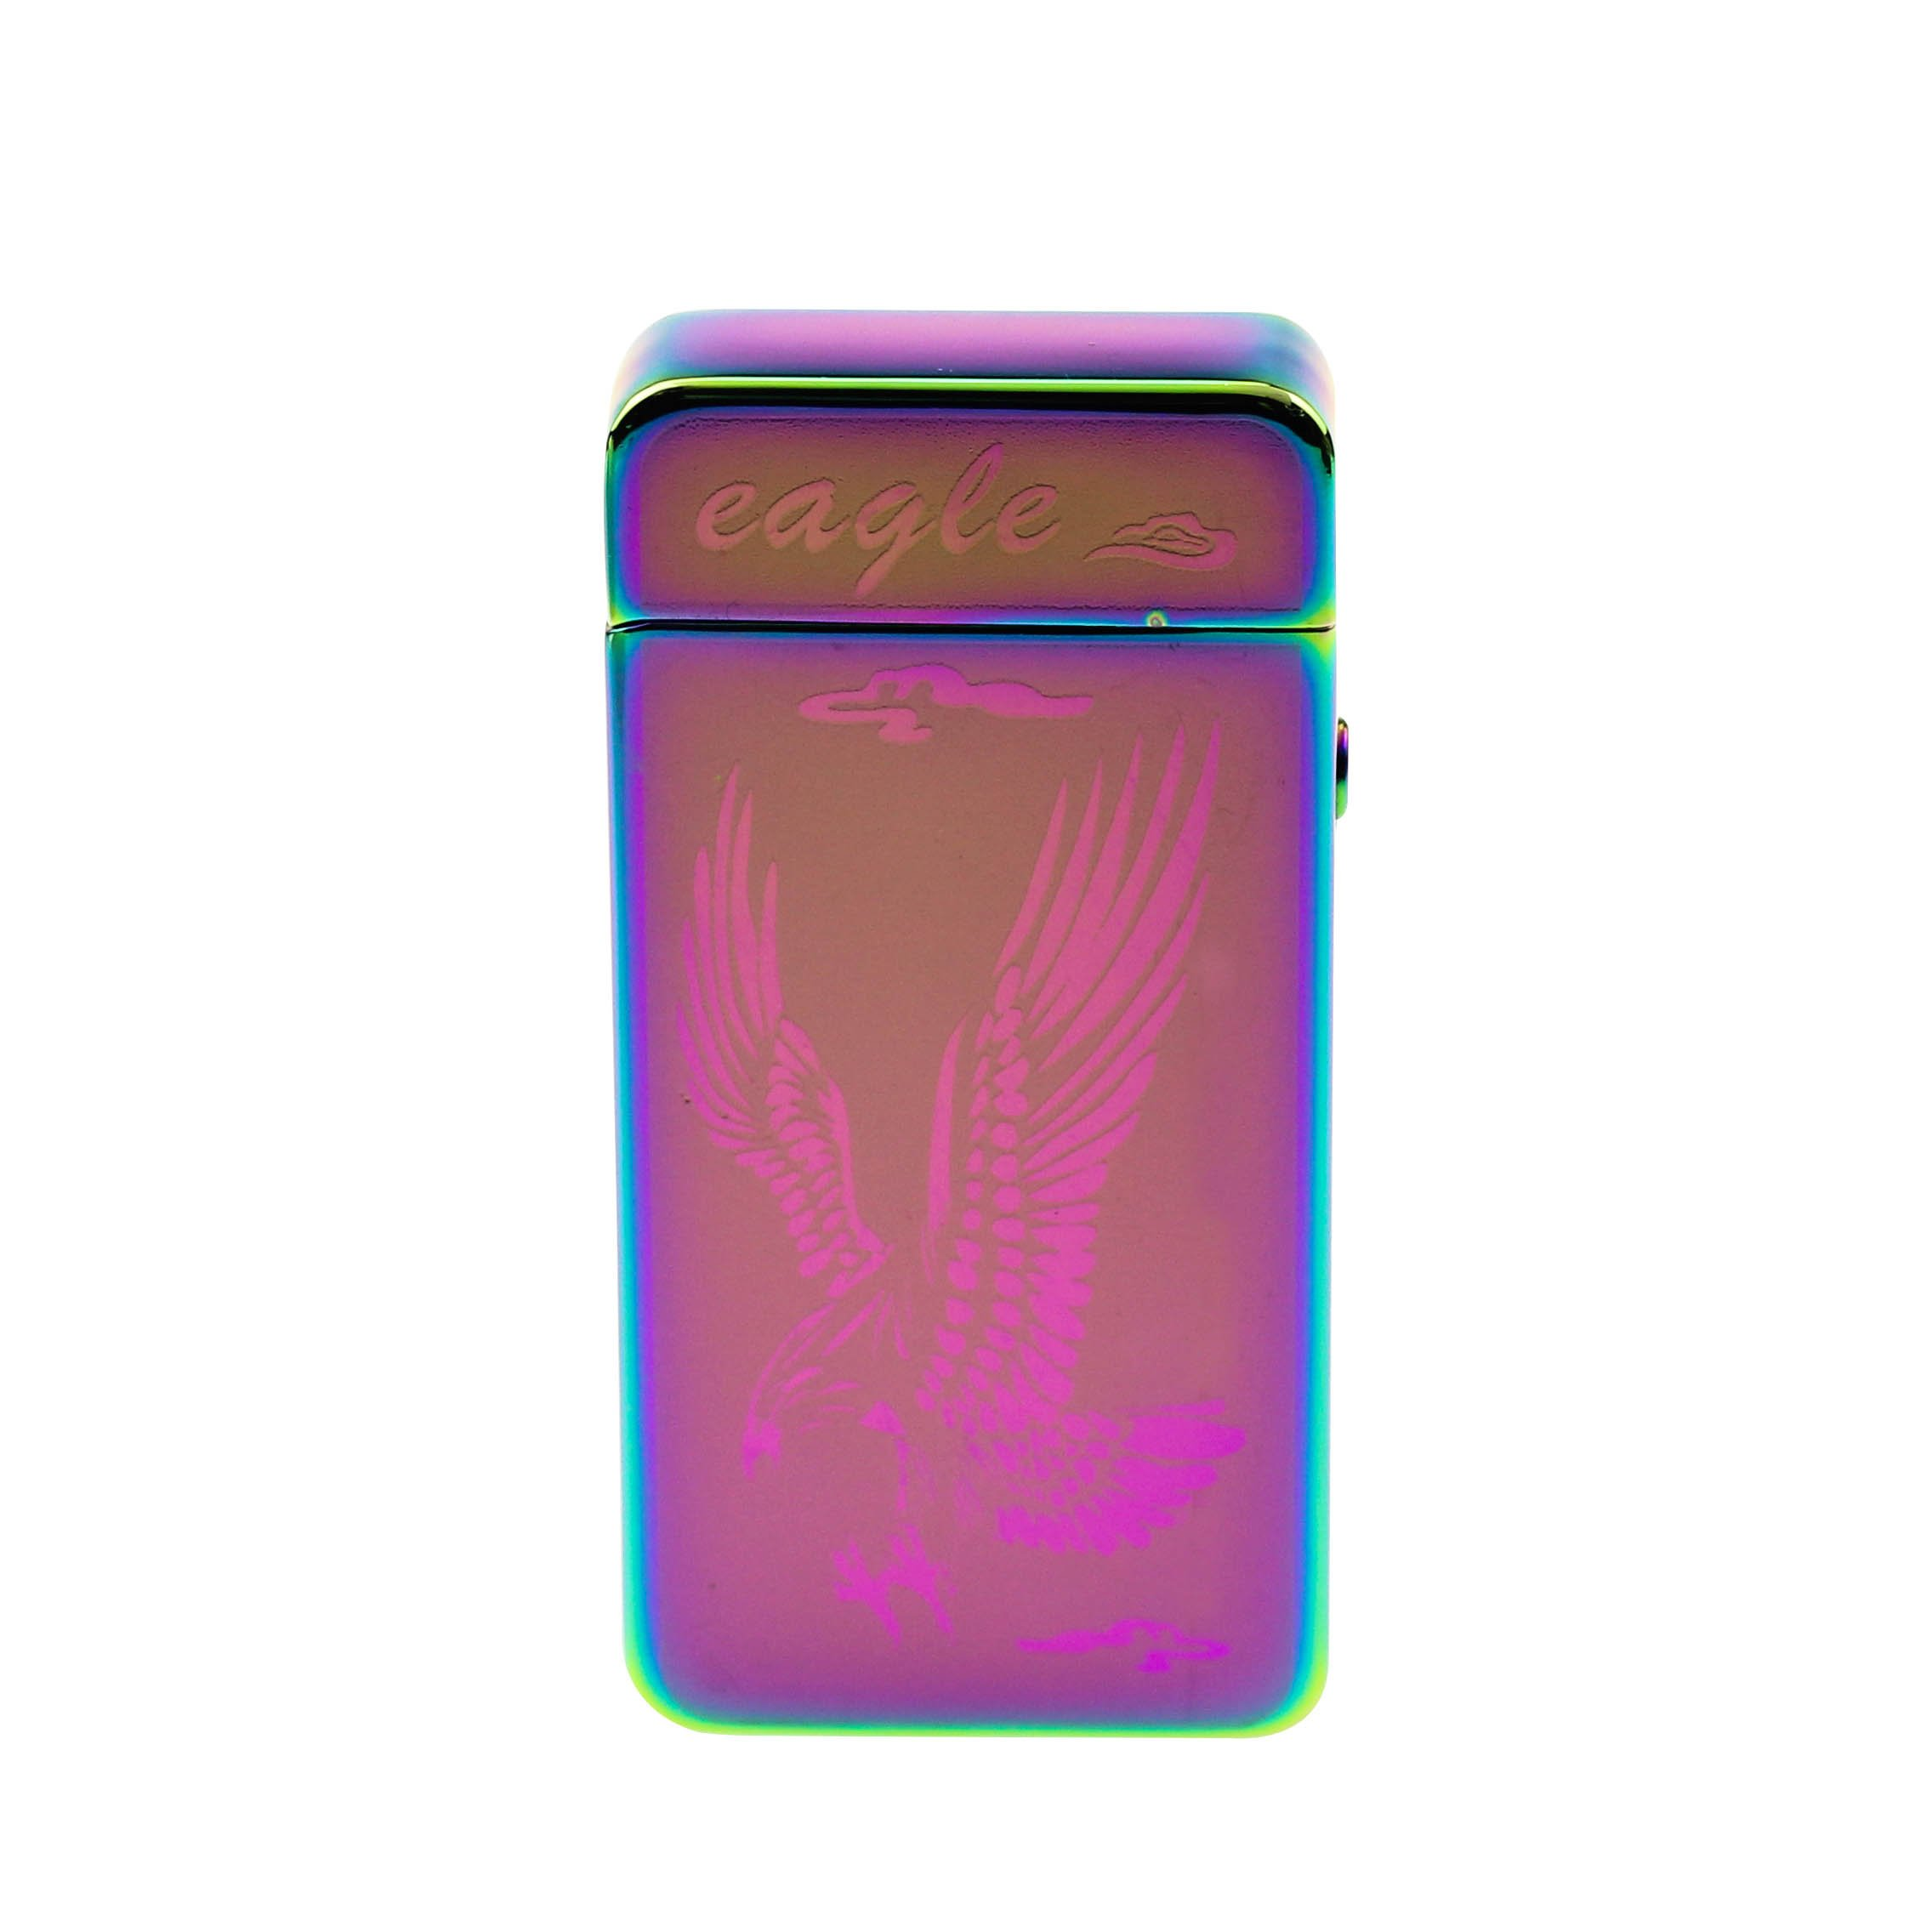 Sunshine USB Lighter Dual Arcs Flameless Windproof Wider Arcs Plasma Beam Dual Arc Lighter USB cable included (Rainbow Eagle) by Sunshine (Image #4)